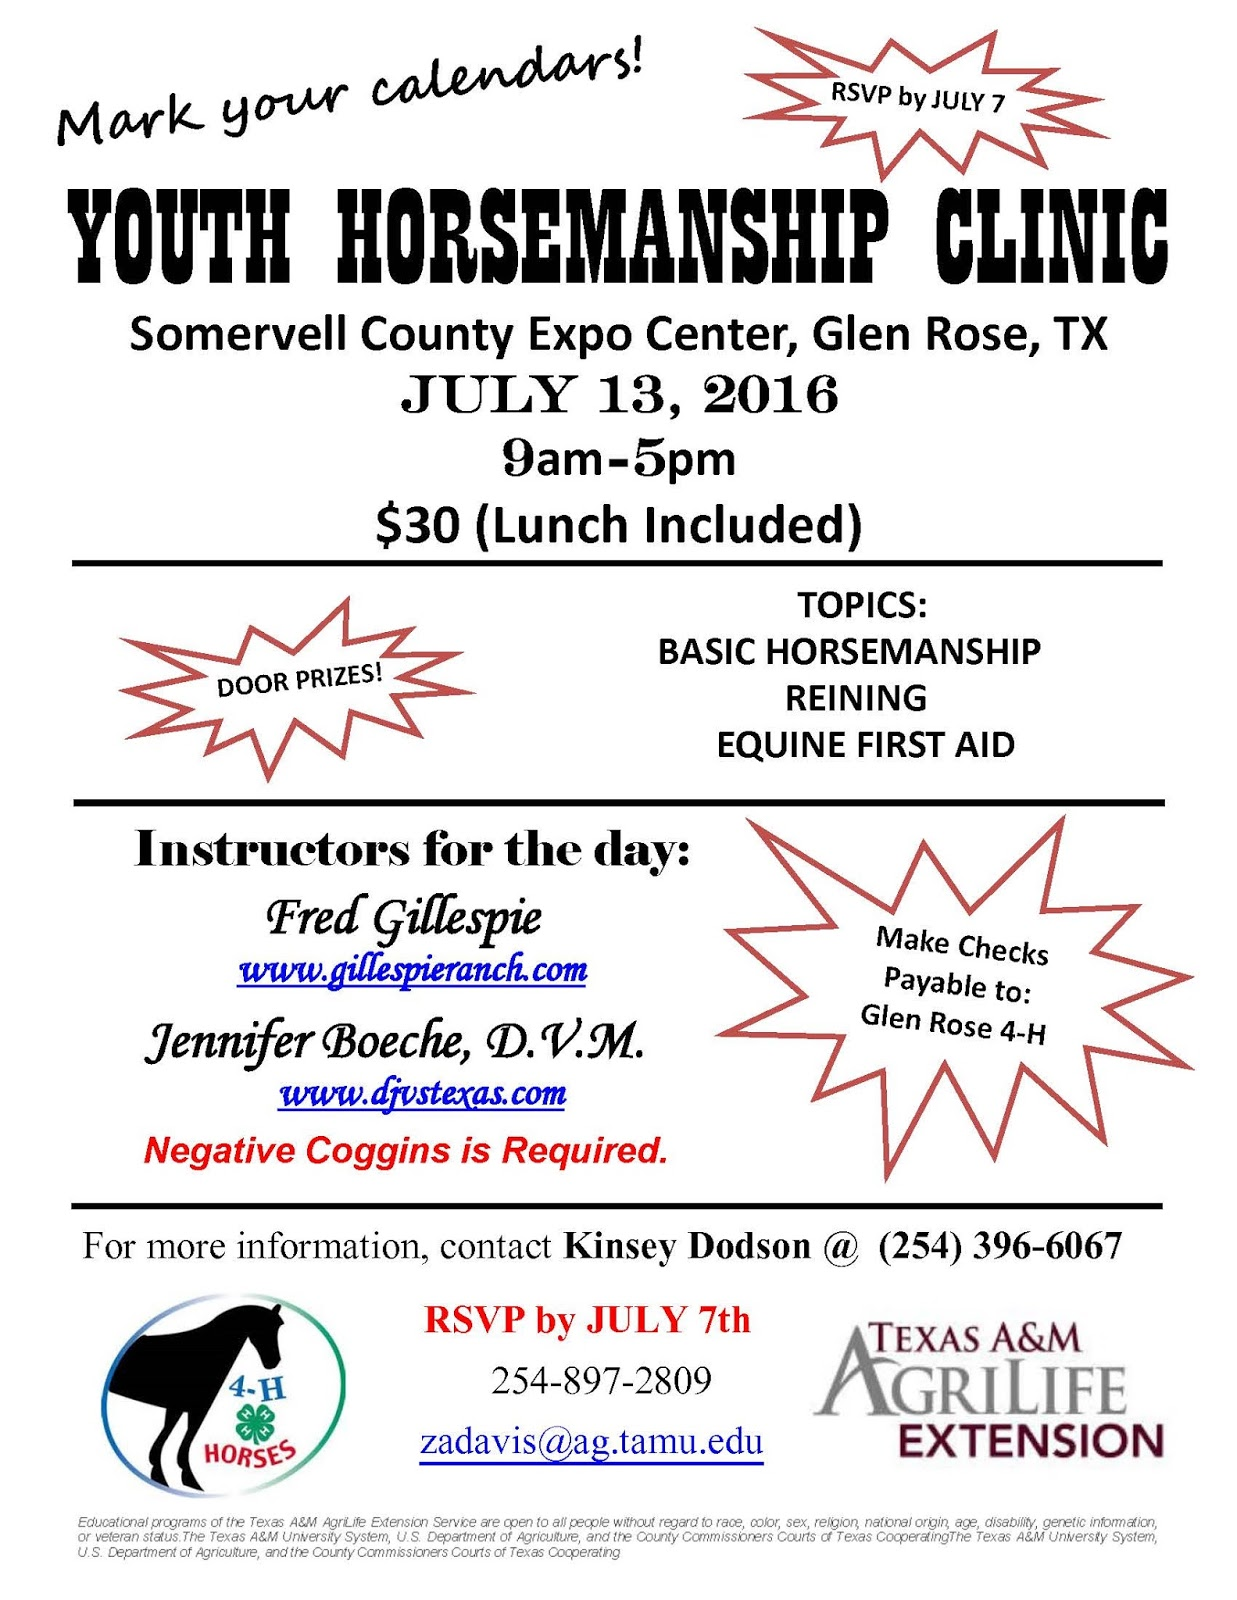 Travis County 4-H: Horsemanship Clinic